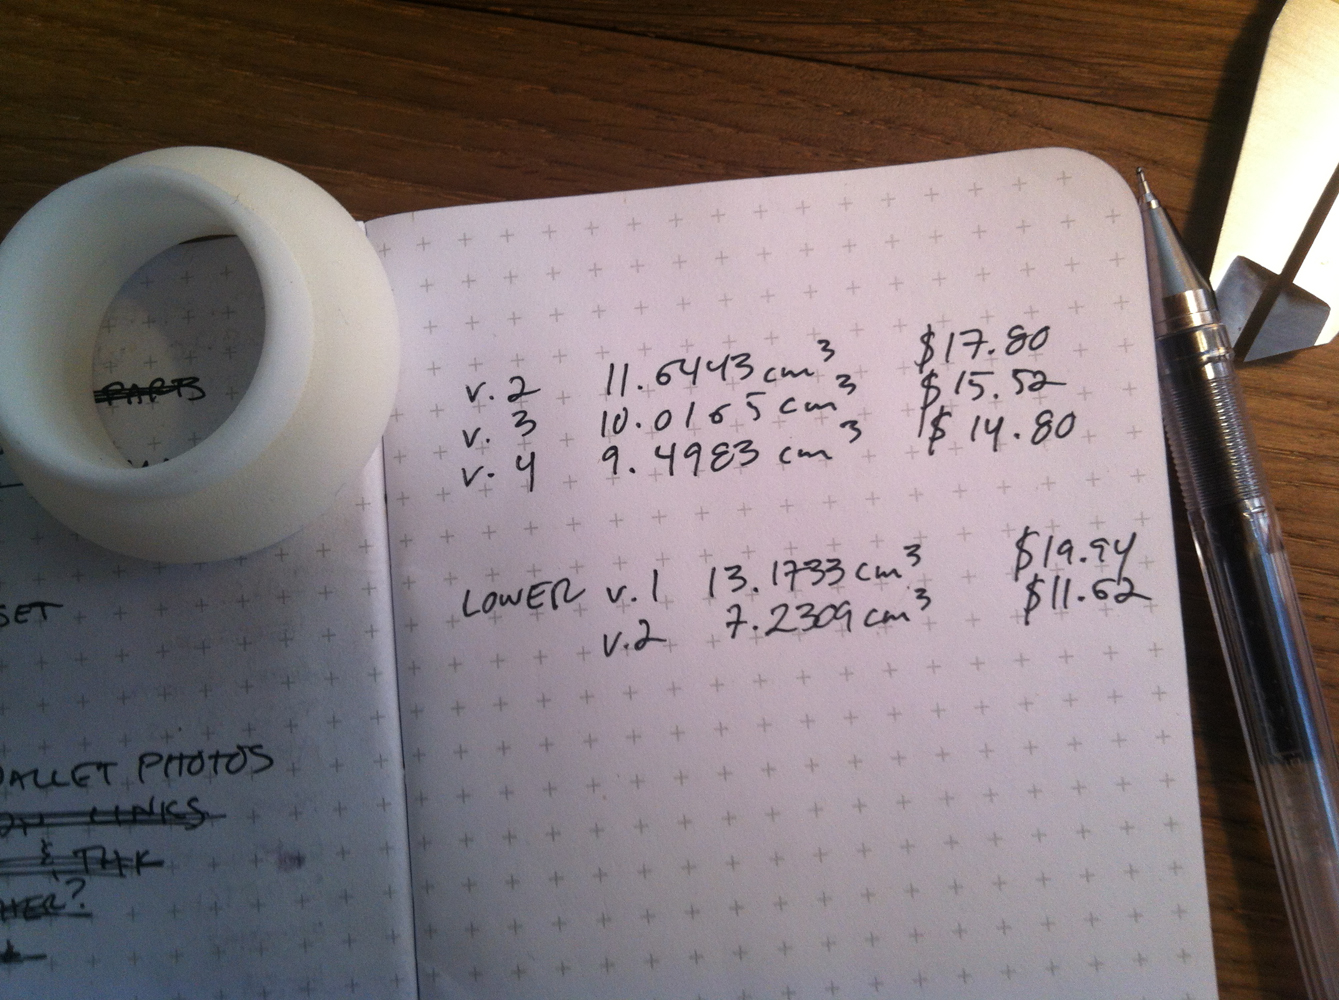 Shapeways' volume/price breakdown.